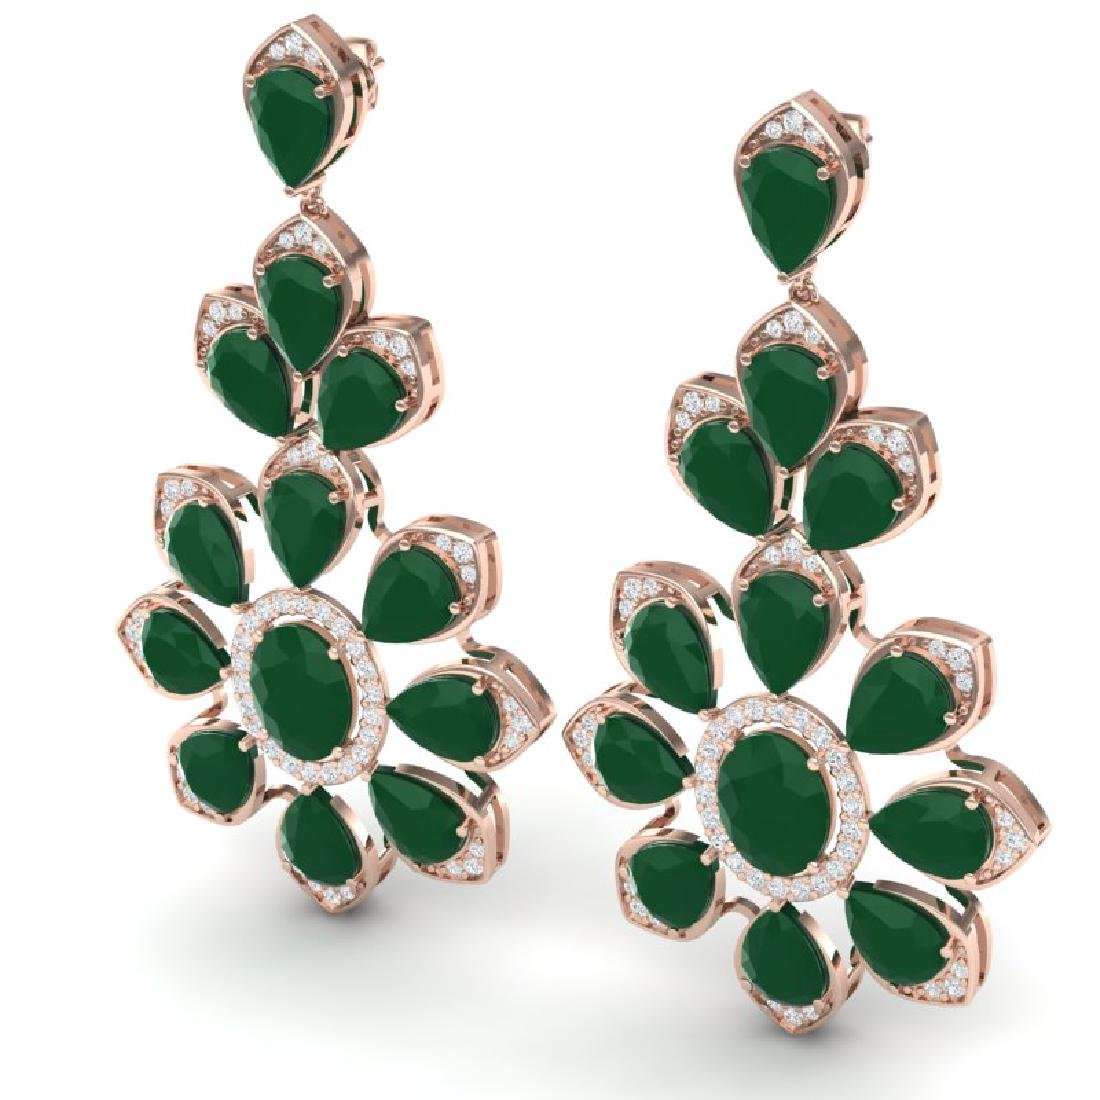 51.8 CTW Royalty Emerald & VS Diamond Earrings 18K Rose - 2